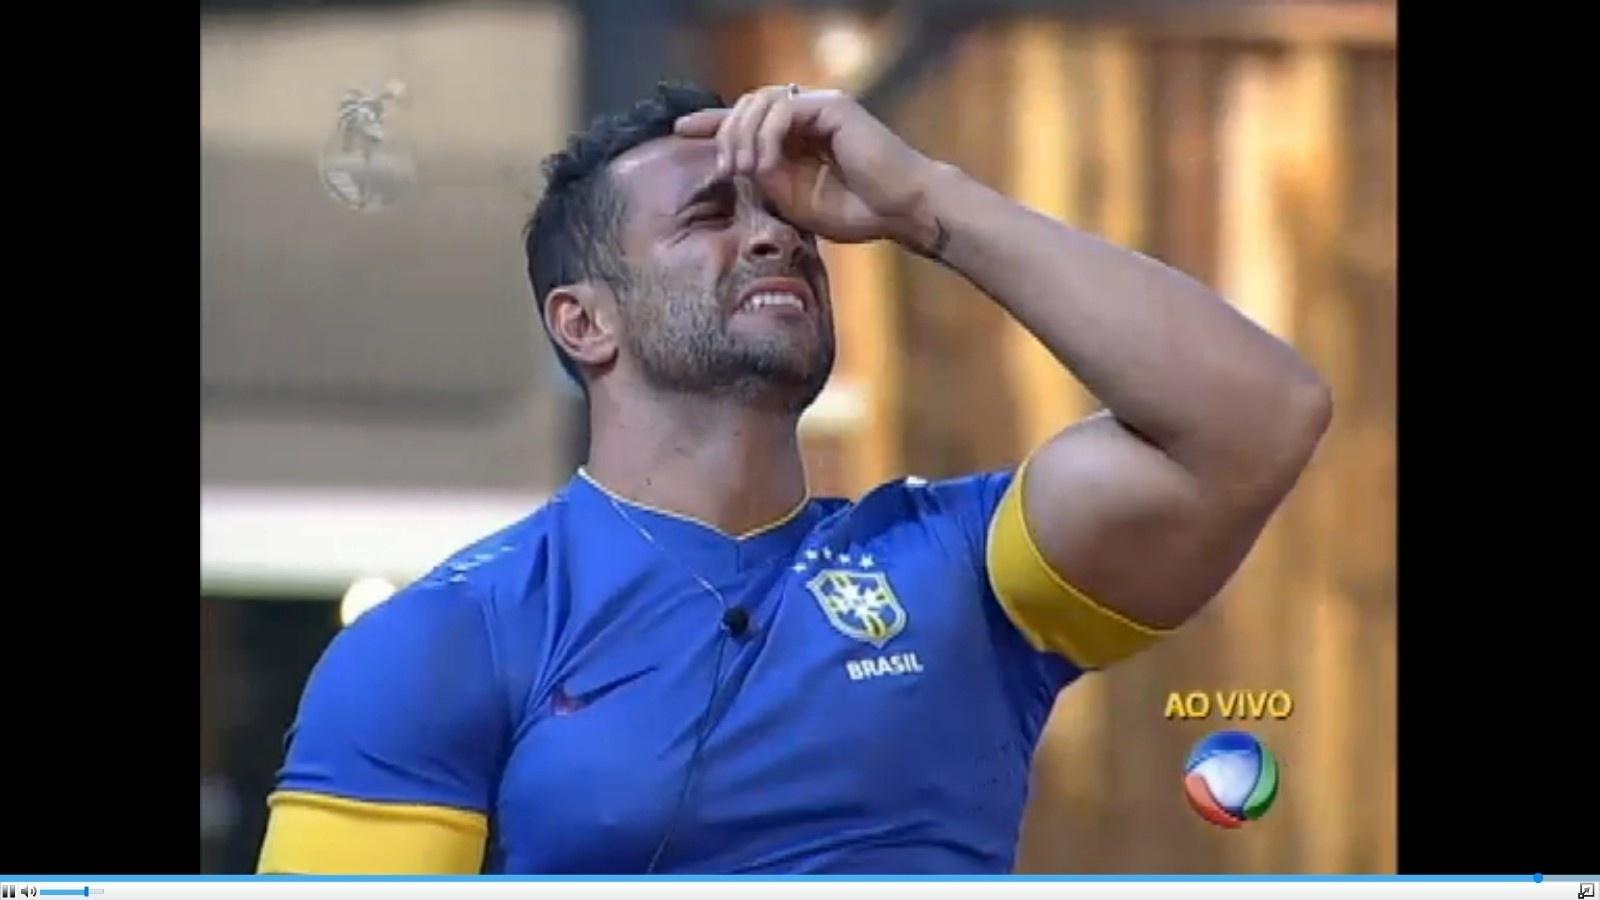 29.jun.2013 - Marcos Oliver ficou emocionado ao saber que estava na final do programa